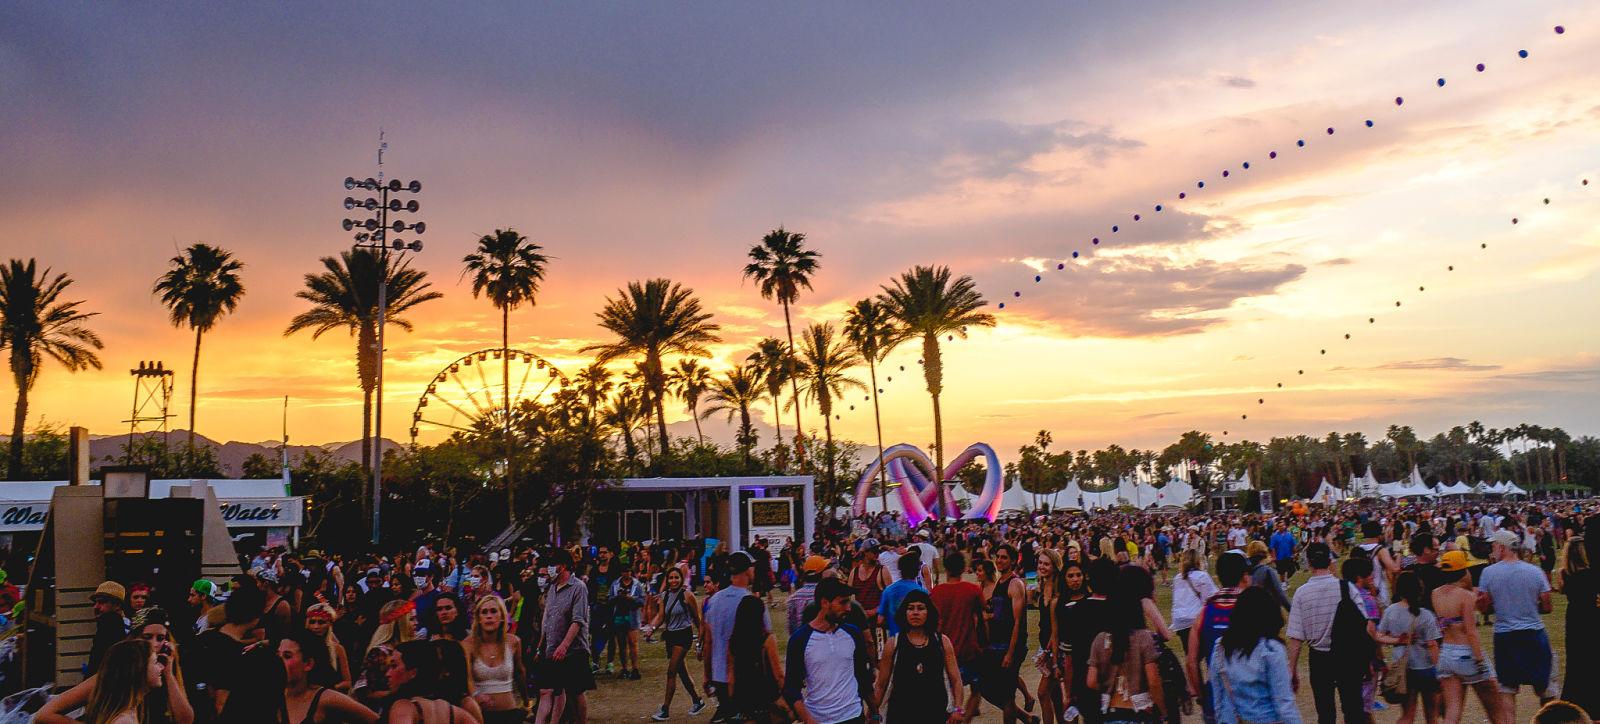 5 festivales baratos como alternativa al Coachella